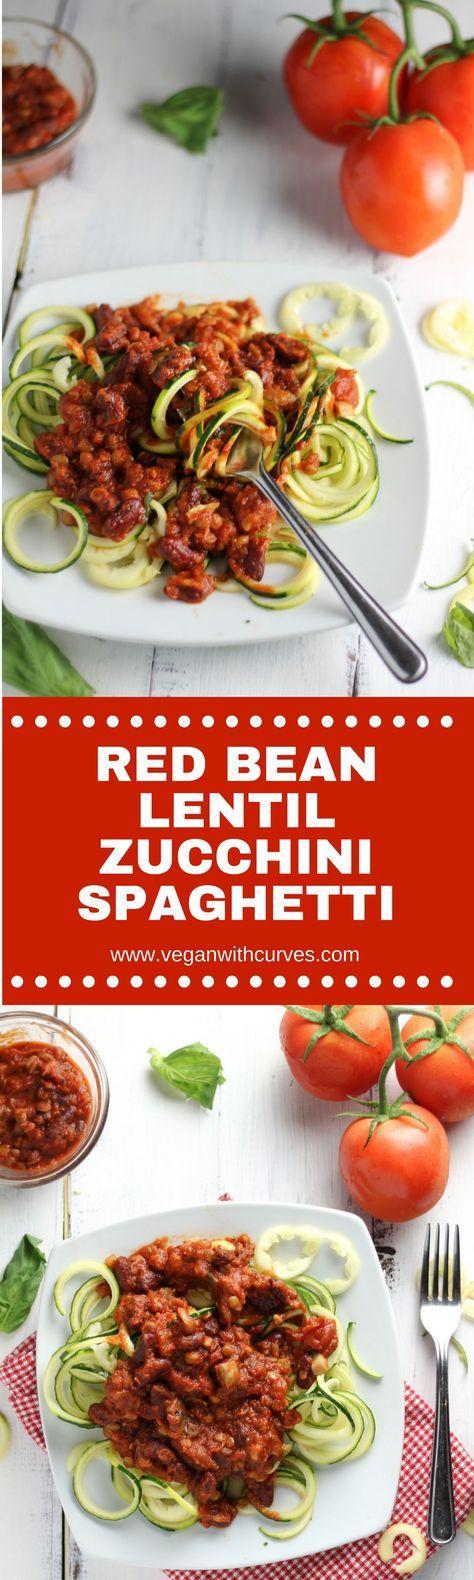 Summer Zucchini! Zucchini Spaghetti topped with red bean and lentil spaghetti sauce!